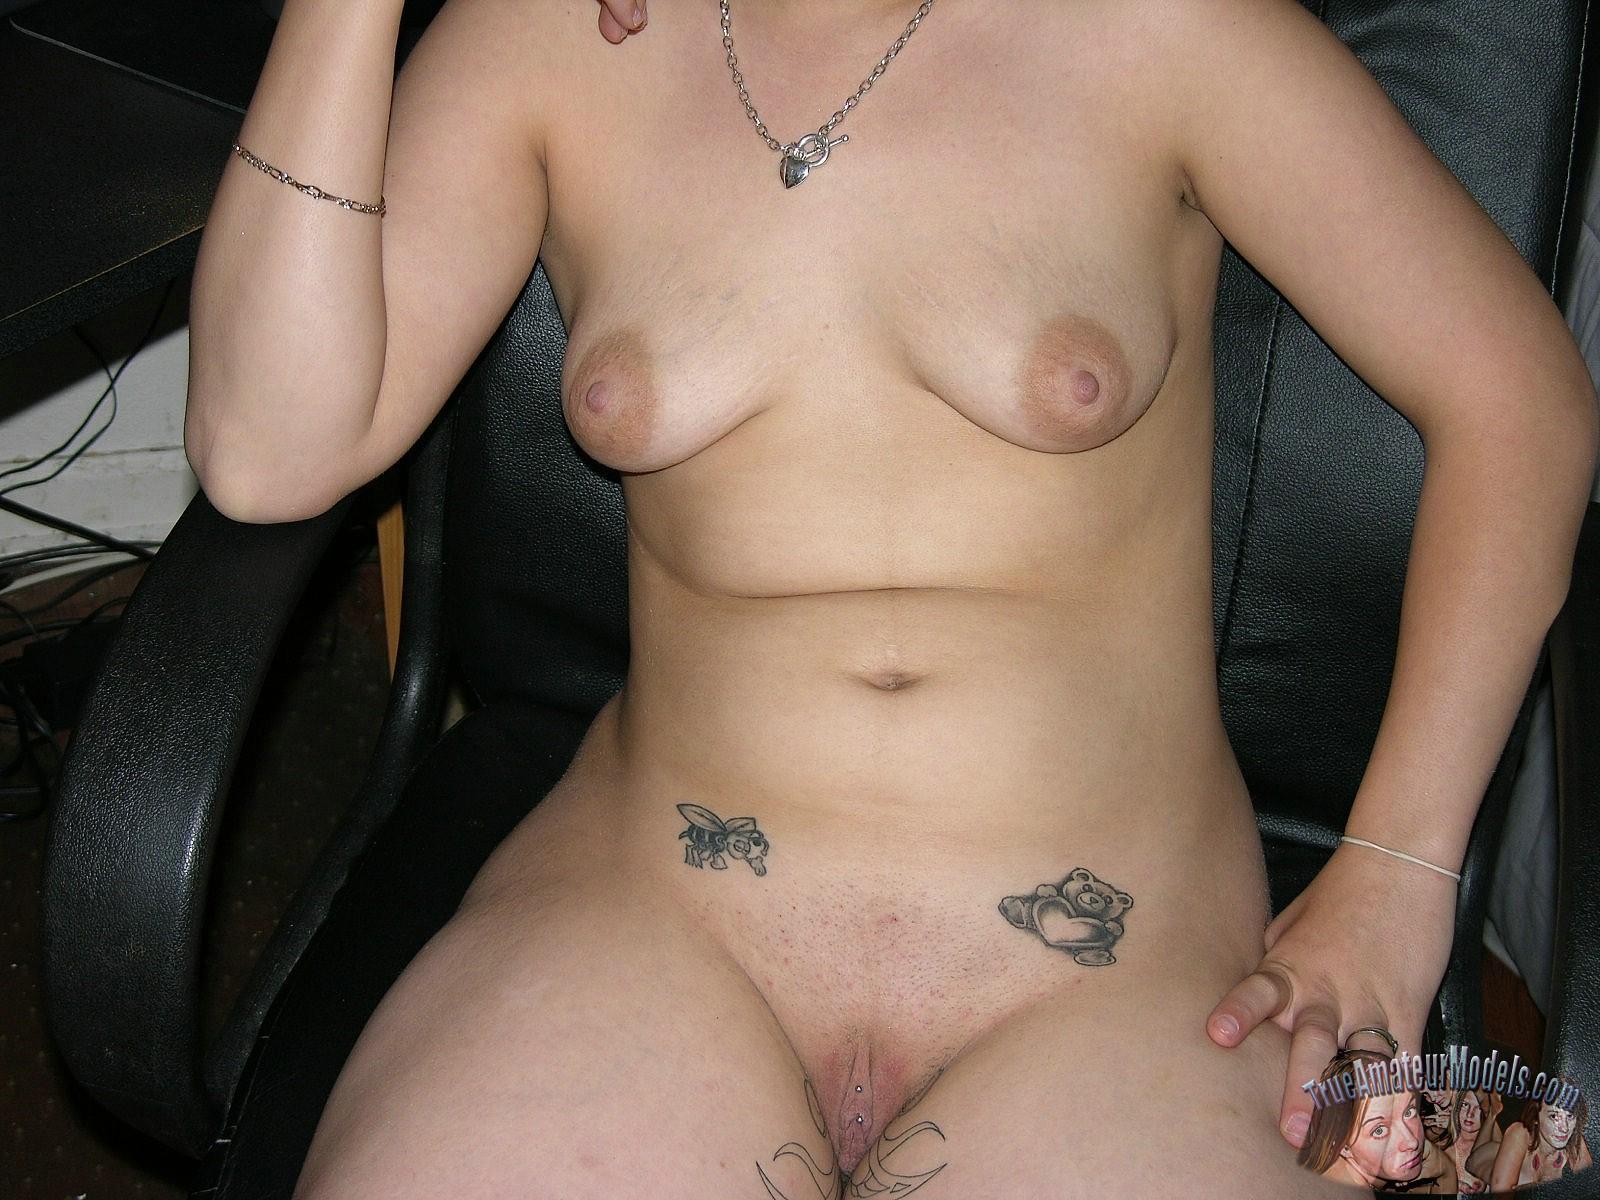 Teens amateur tattoo nude confirm